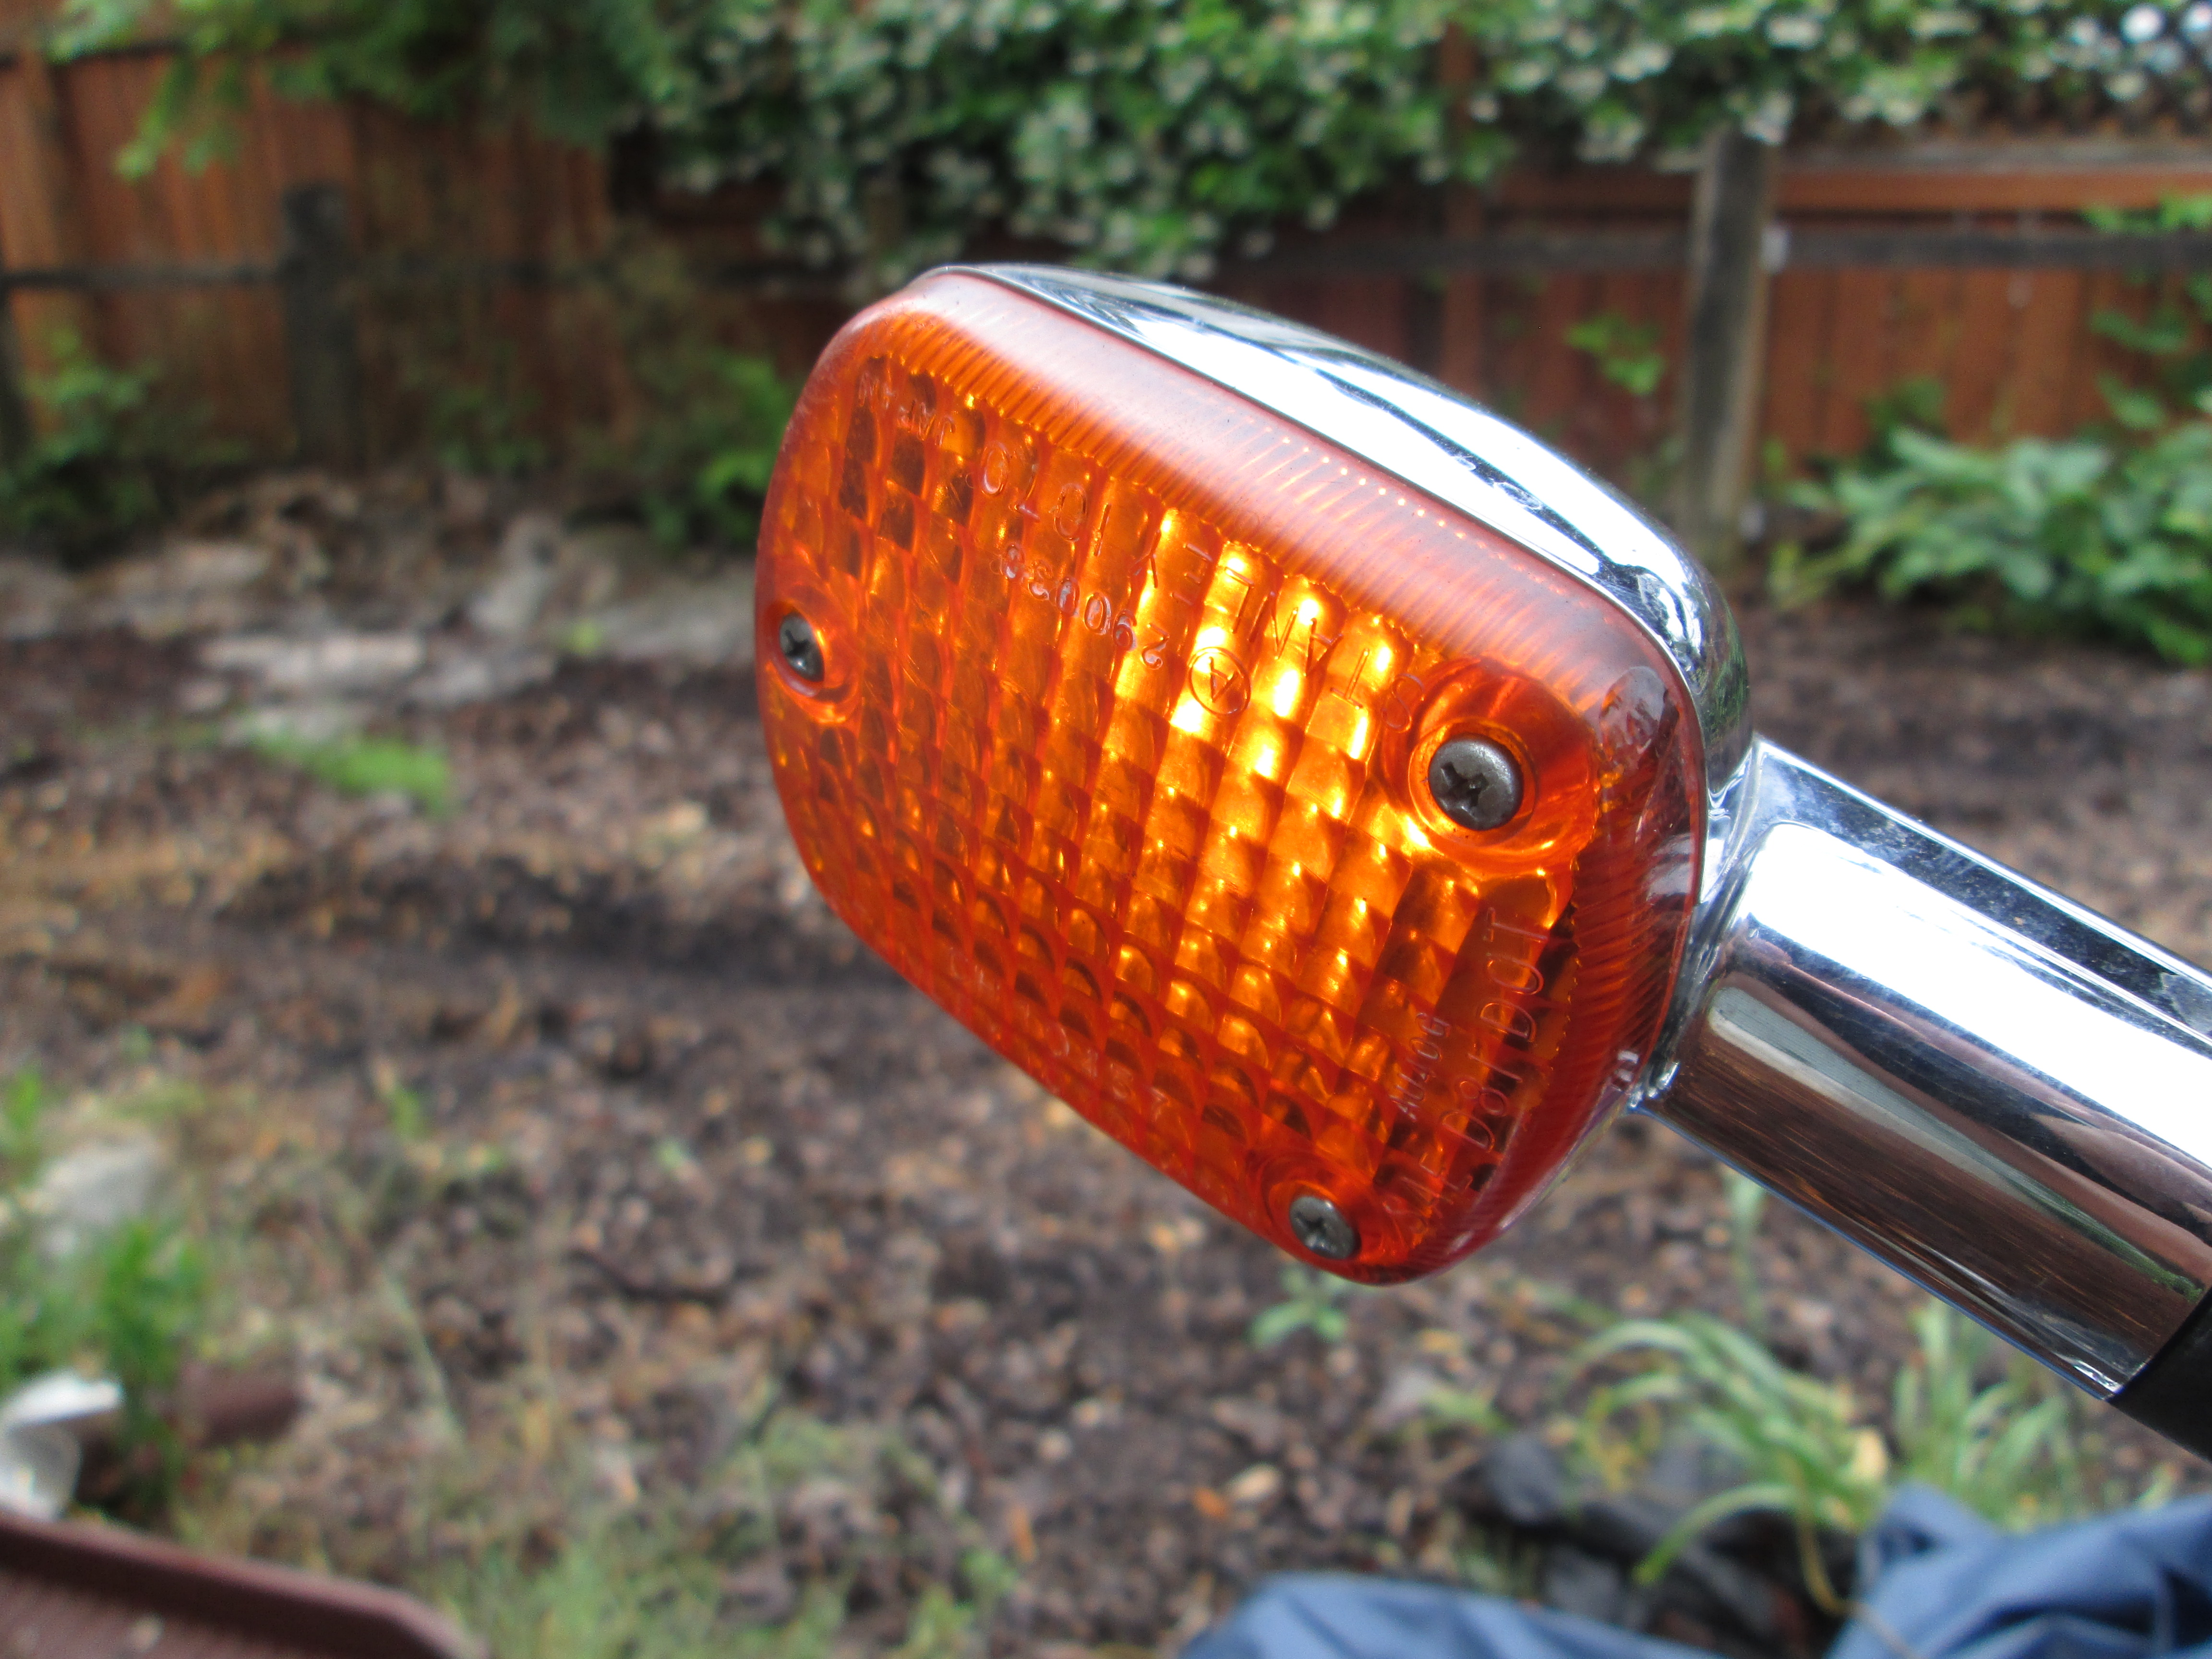 CX650 Custom Turn Signal Relay issues